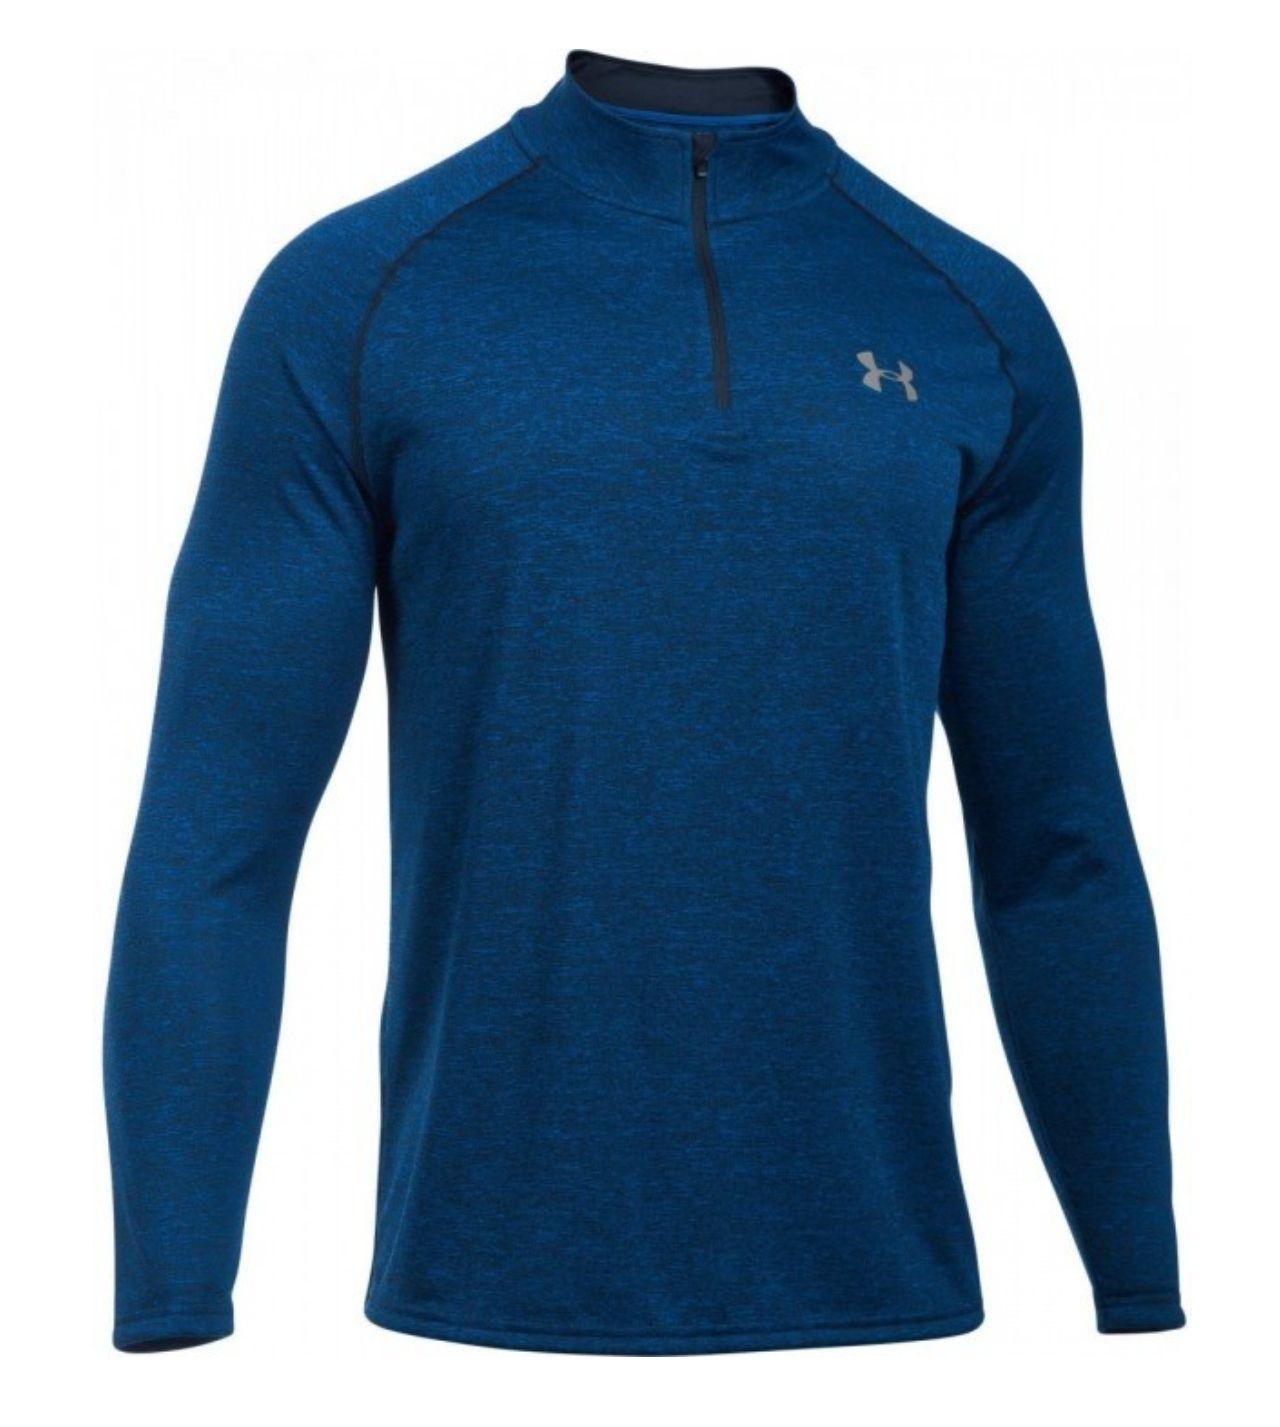 Bluza UNDER ARMOUR Tech 1/4 Zip Blue  Męska do biegania